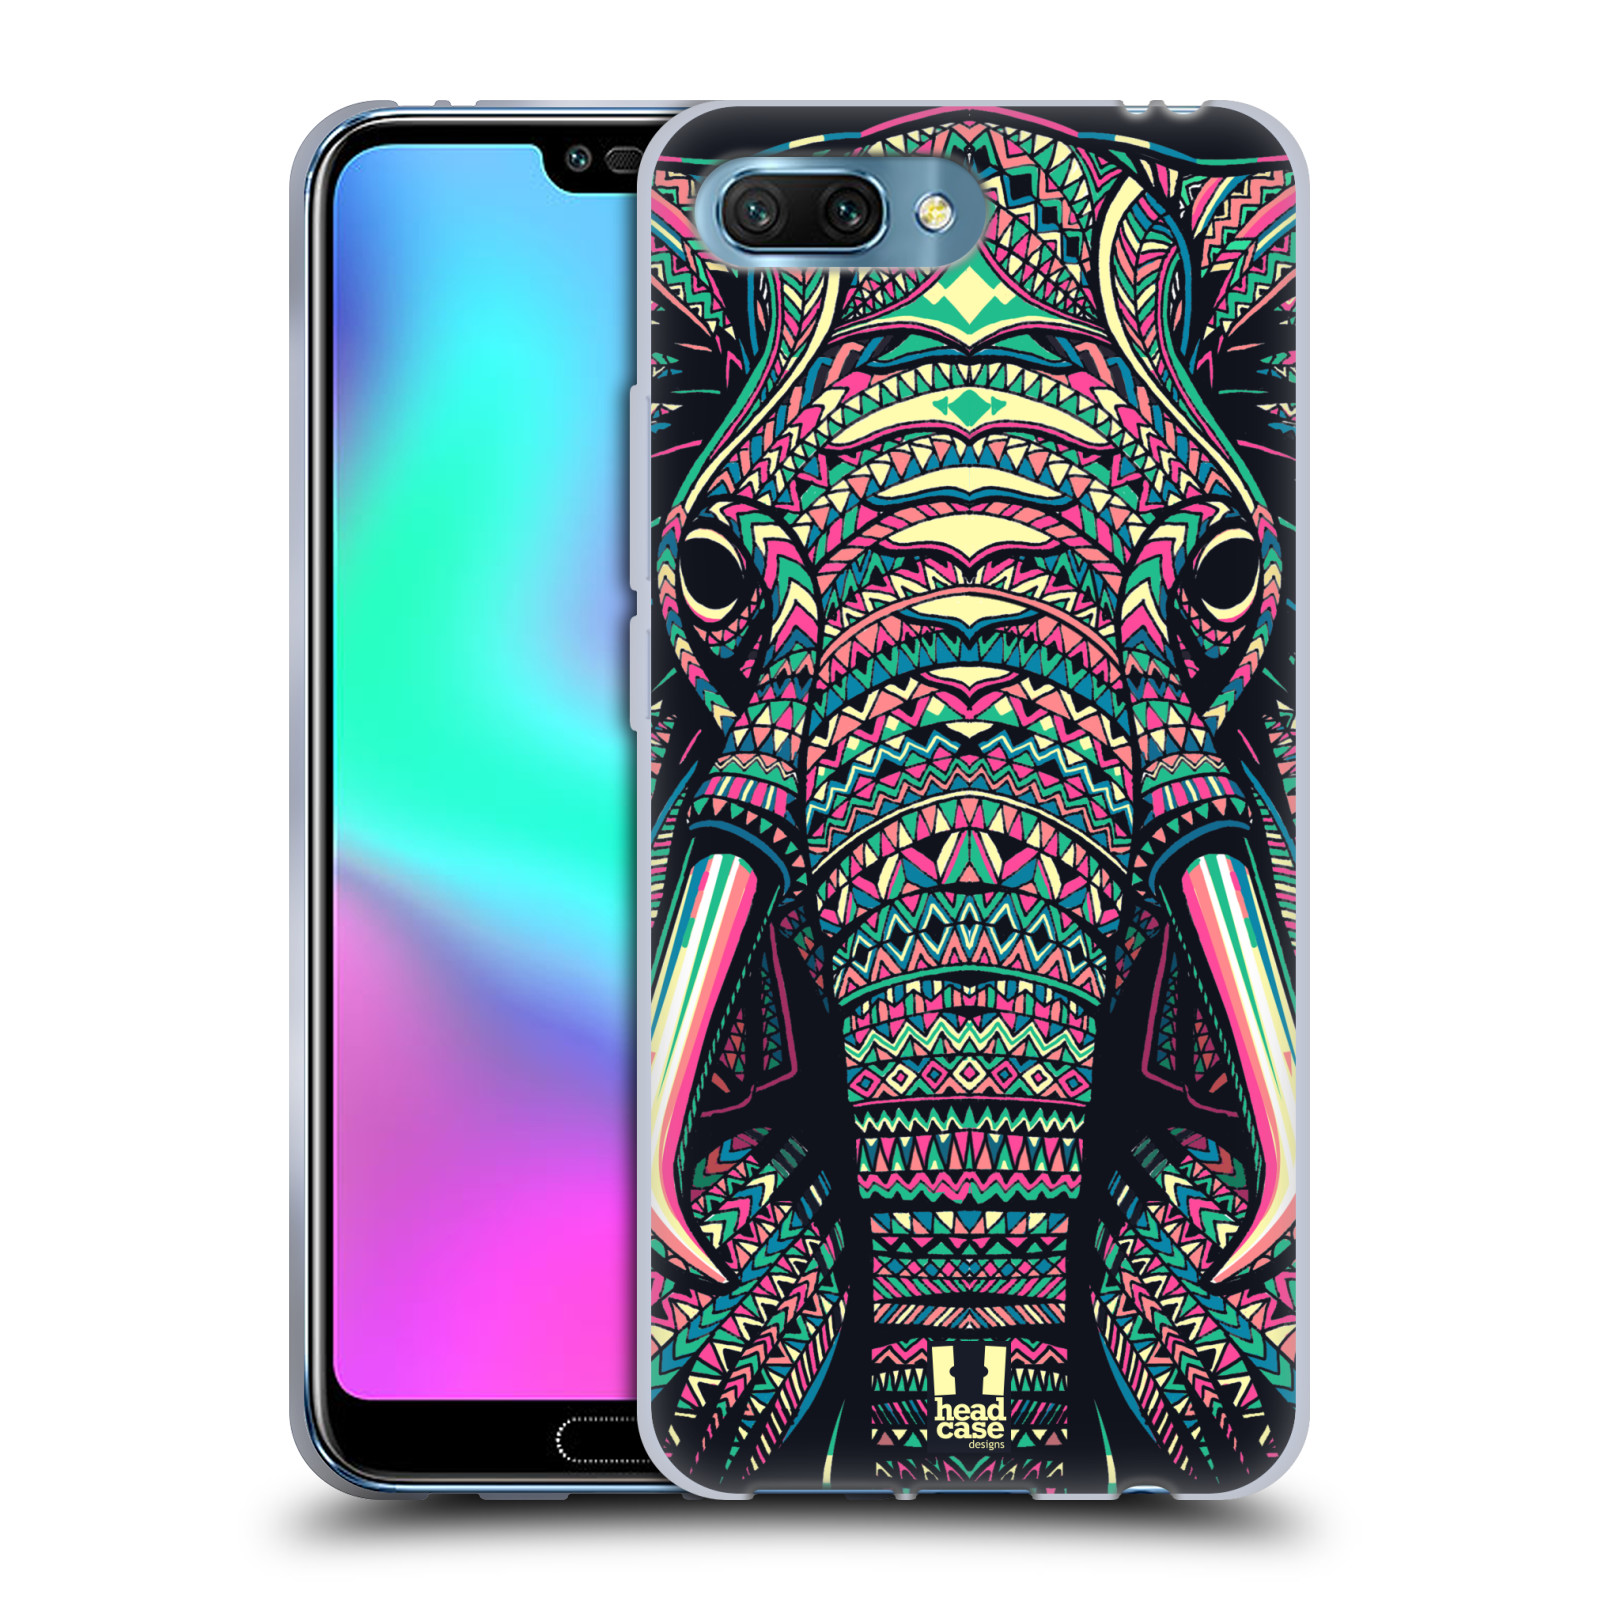 Silikonové pouzdro na mobil Honor 10 - Head Case - AZTEC SLON